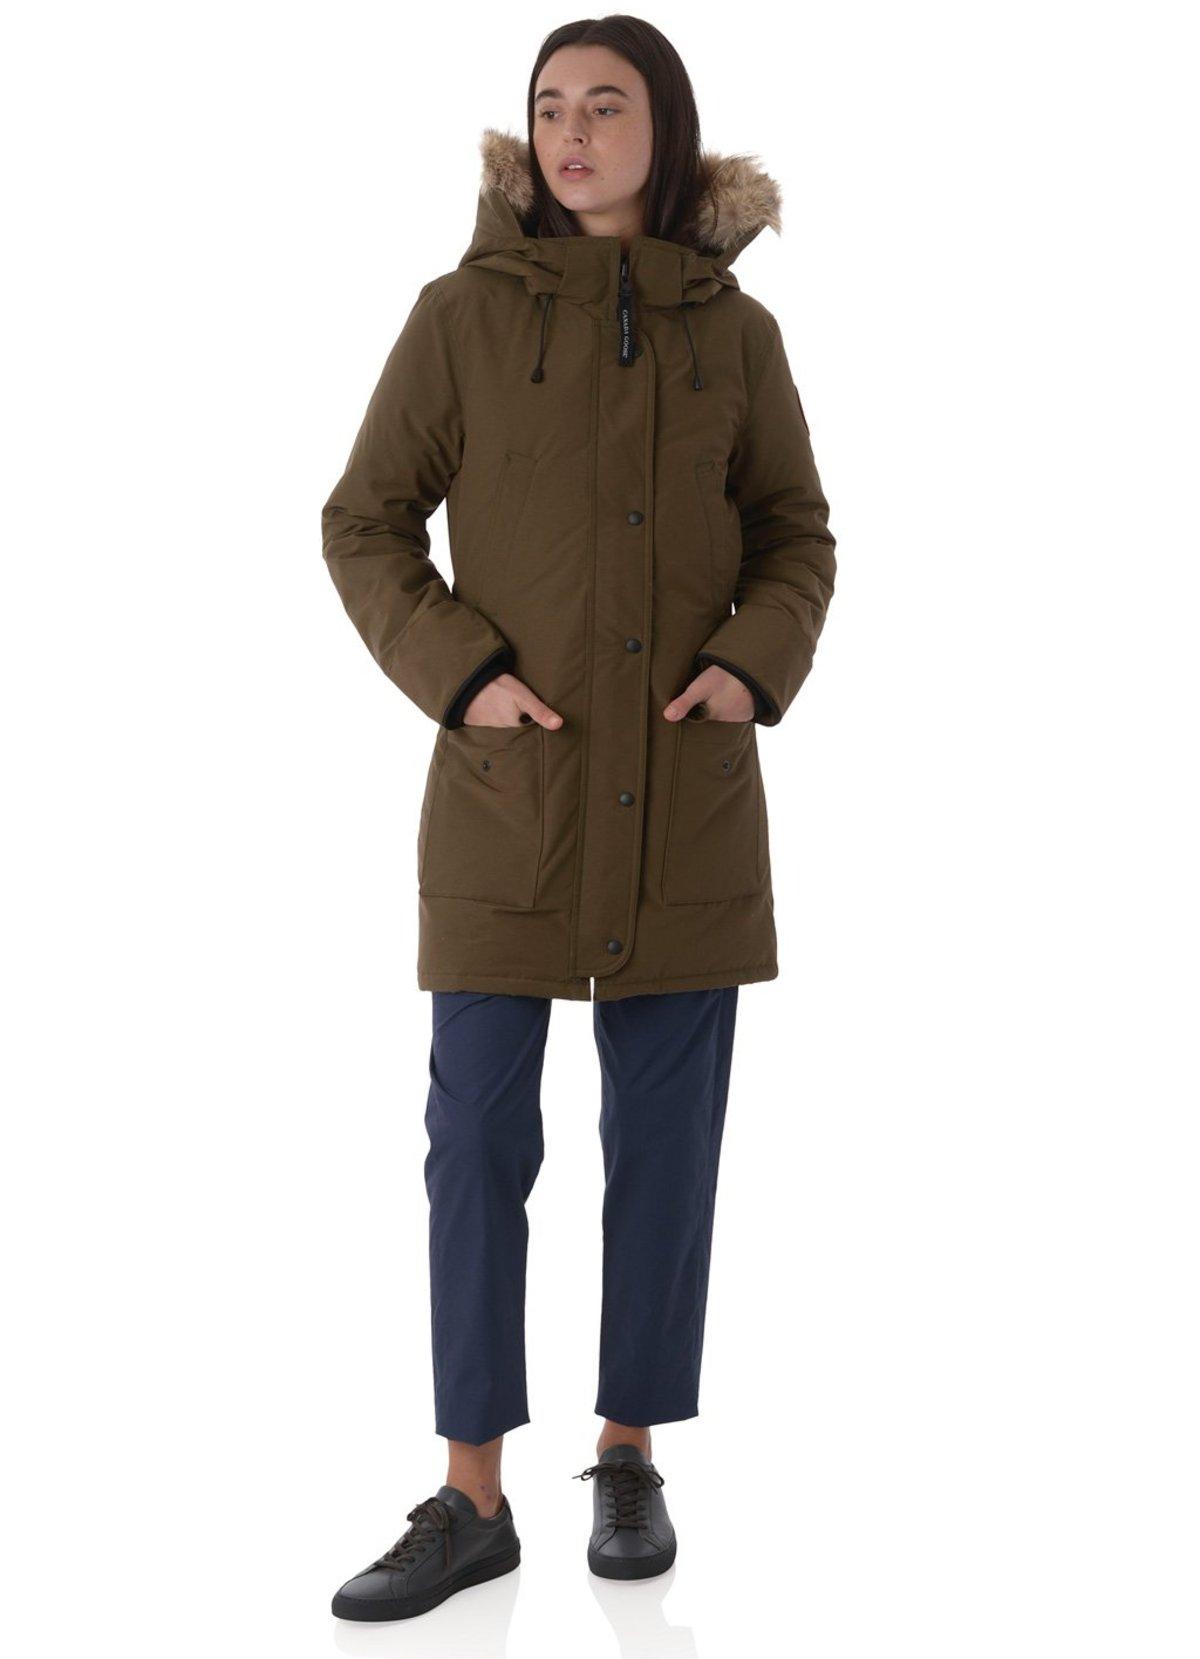 17188ac37a2 Canada Goose Trillium Parka - Military Green   Garmentory